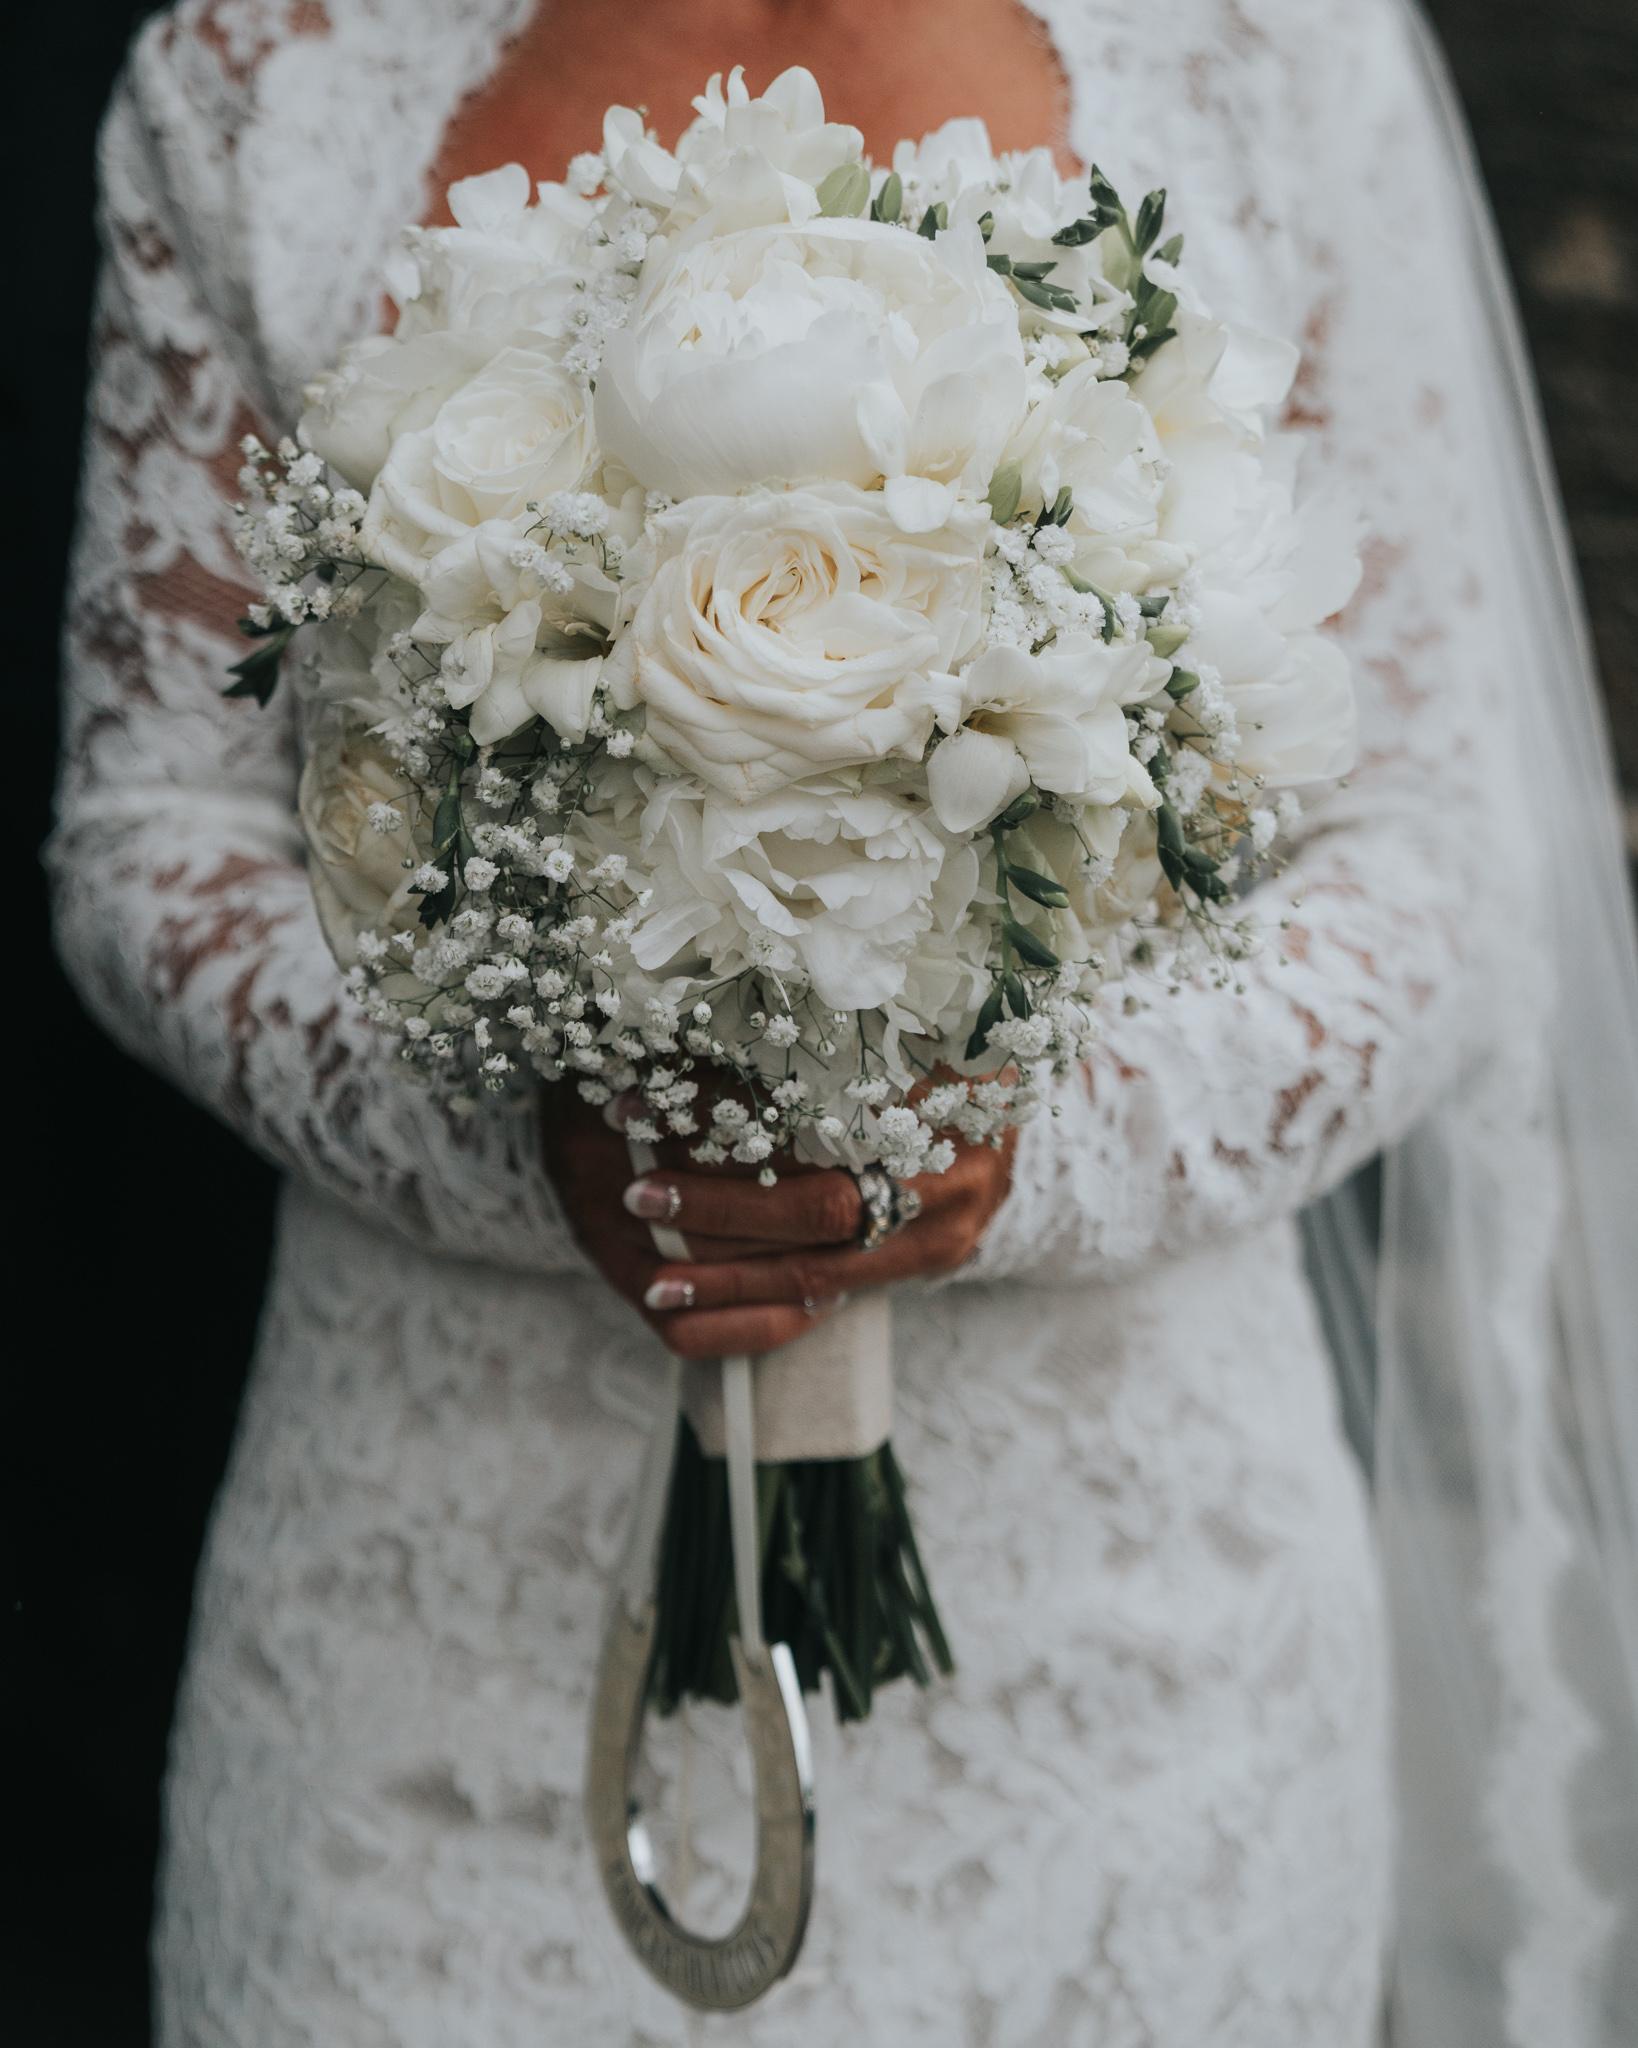 grace-elizabeth-boho-wedding-headingham-castle-essex-wedding-photographer-54.jpg